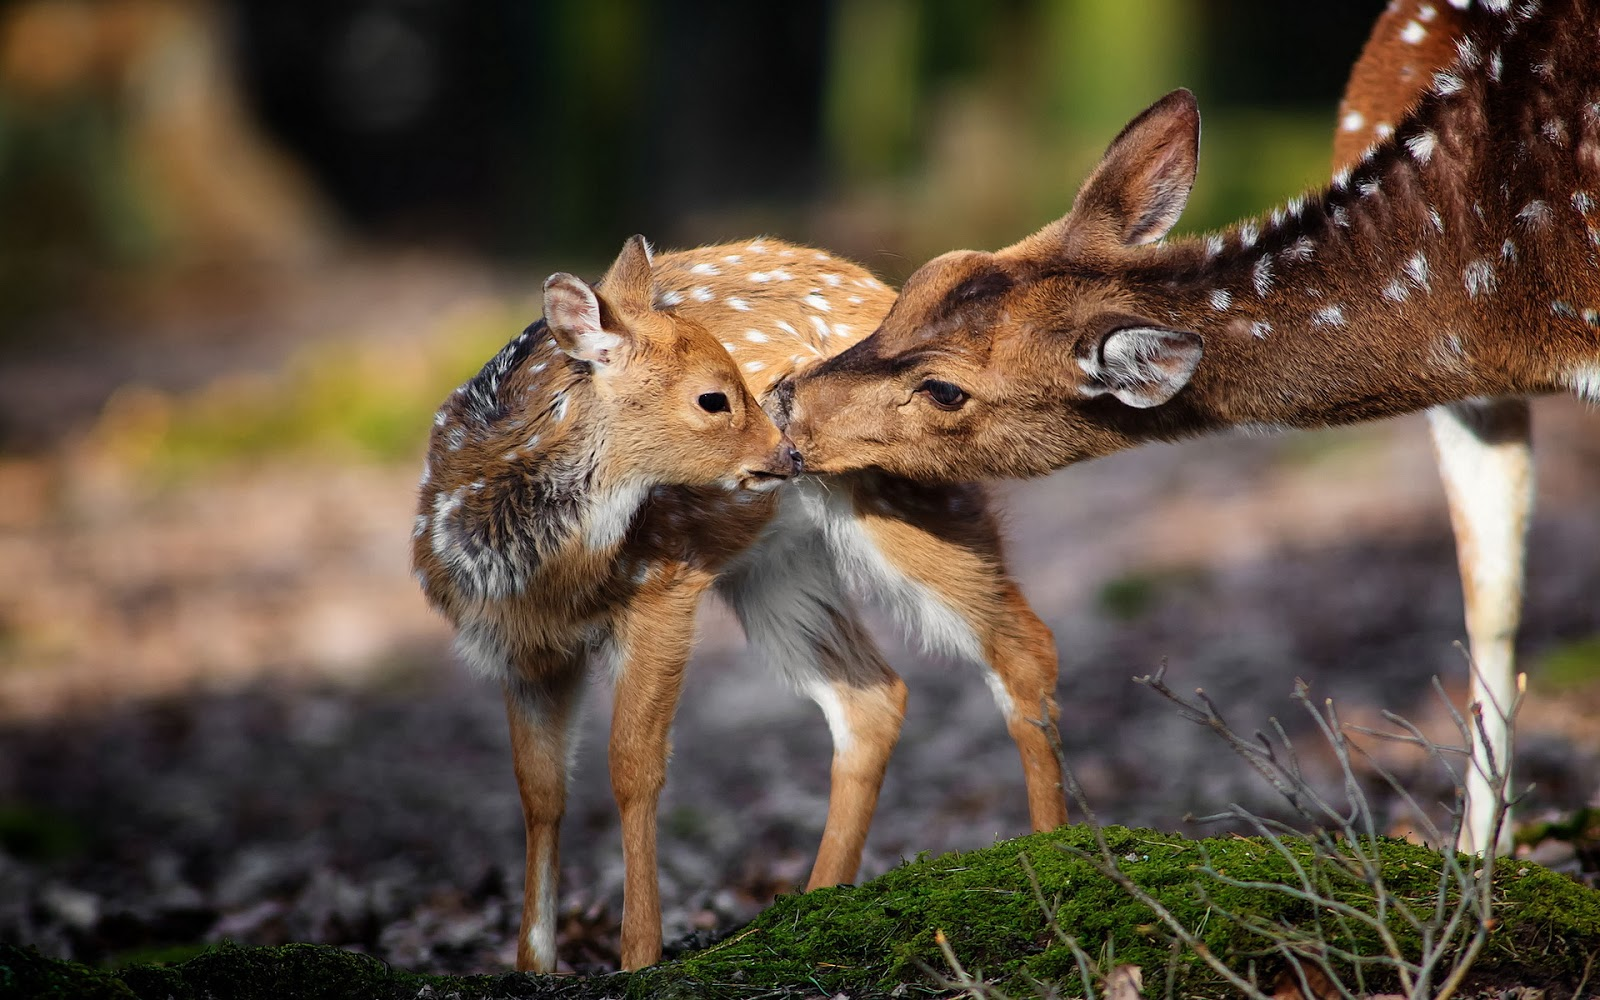 Deer Nature Animals Fawns Baby Animals Wallpapers Hd: Beautiful Wallpapers: Deer Wallpaper